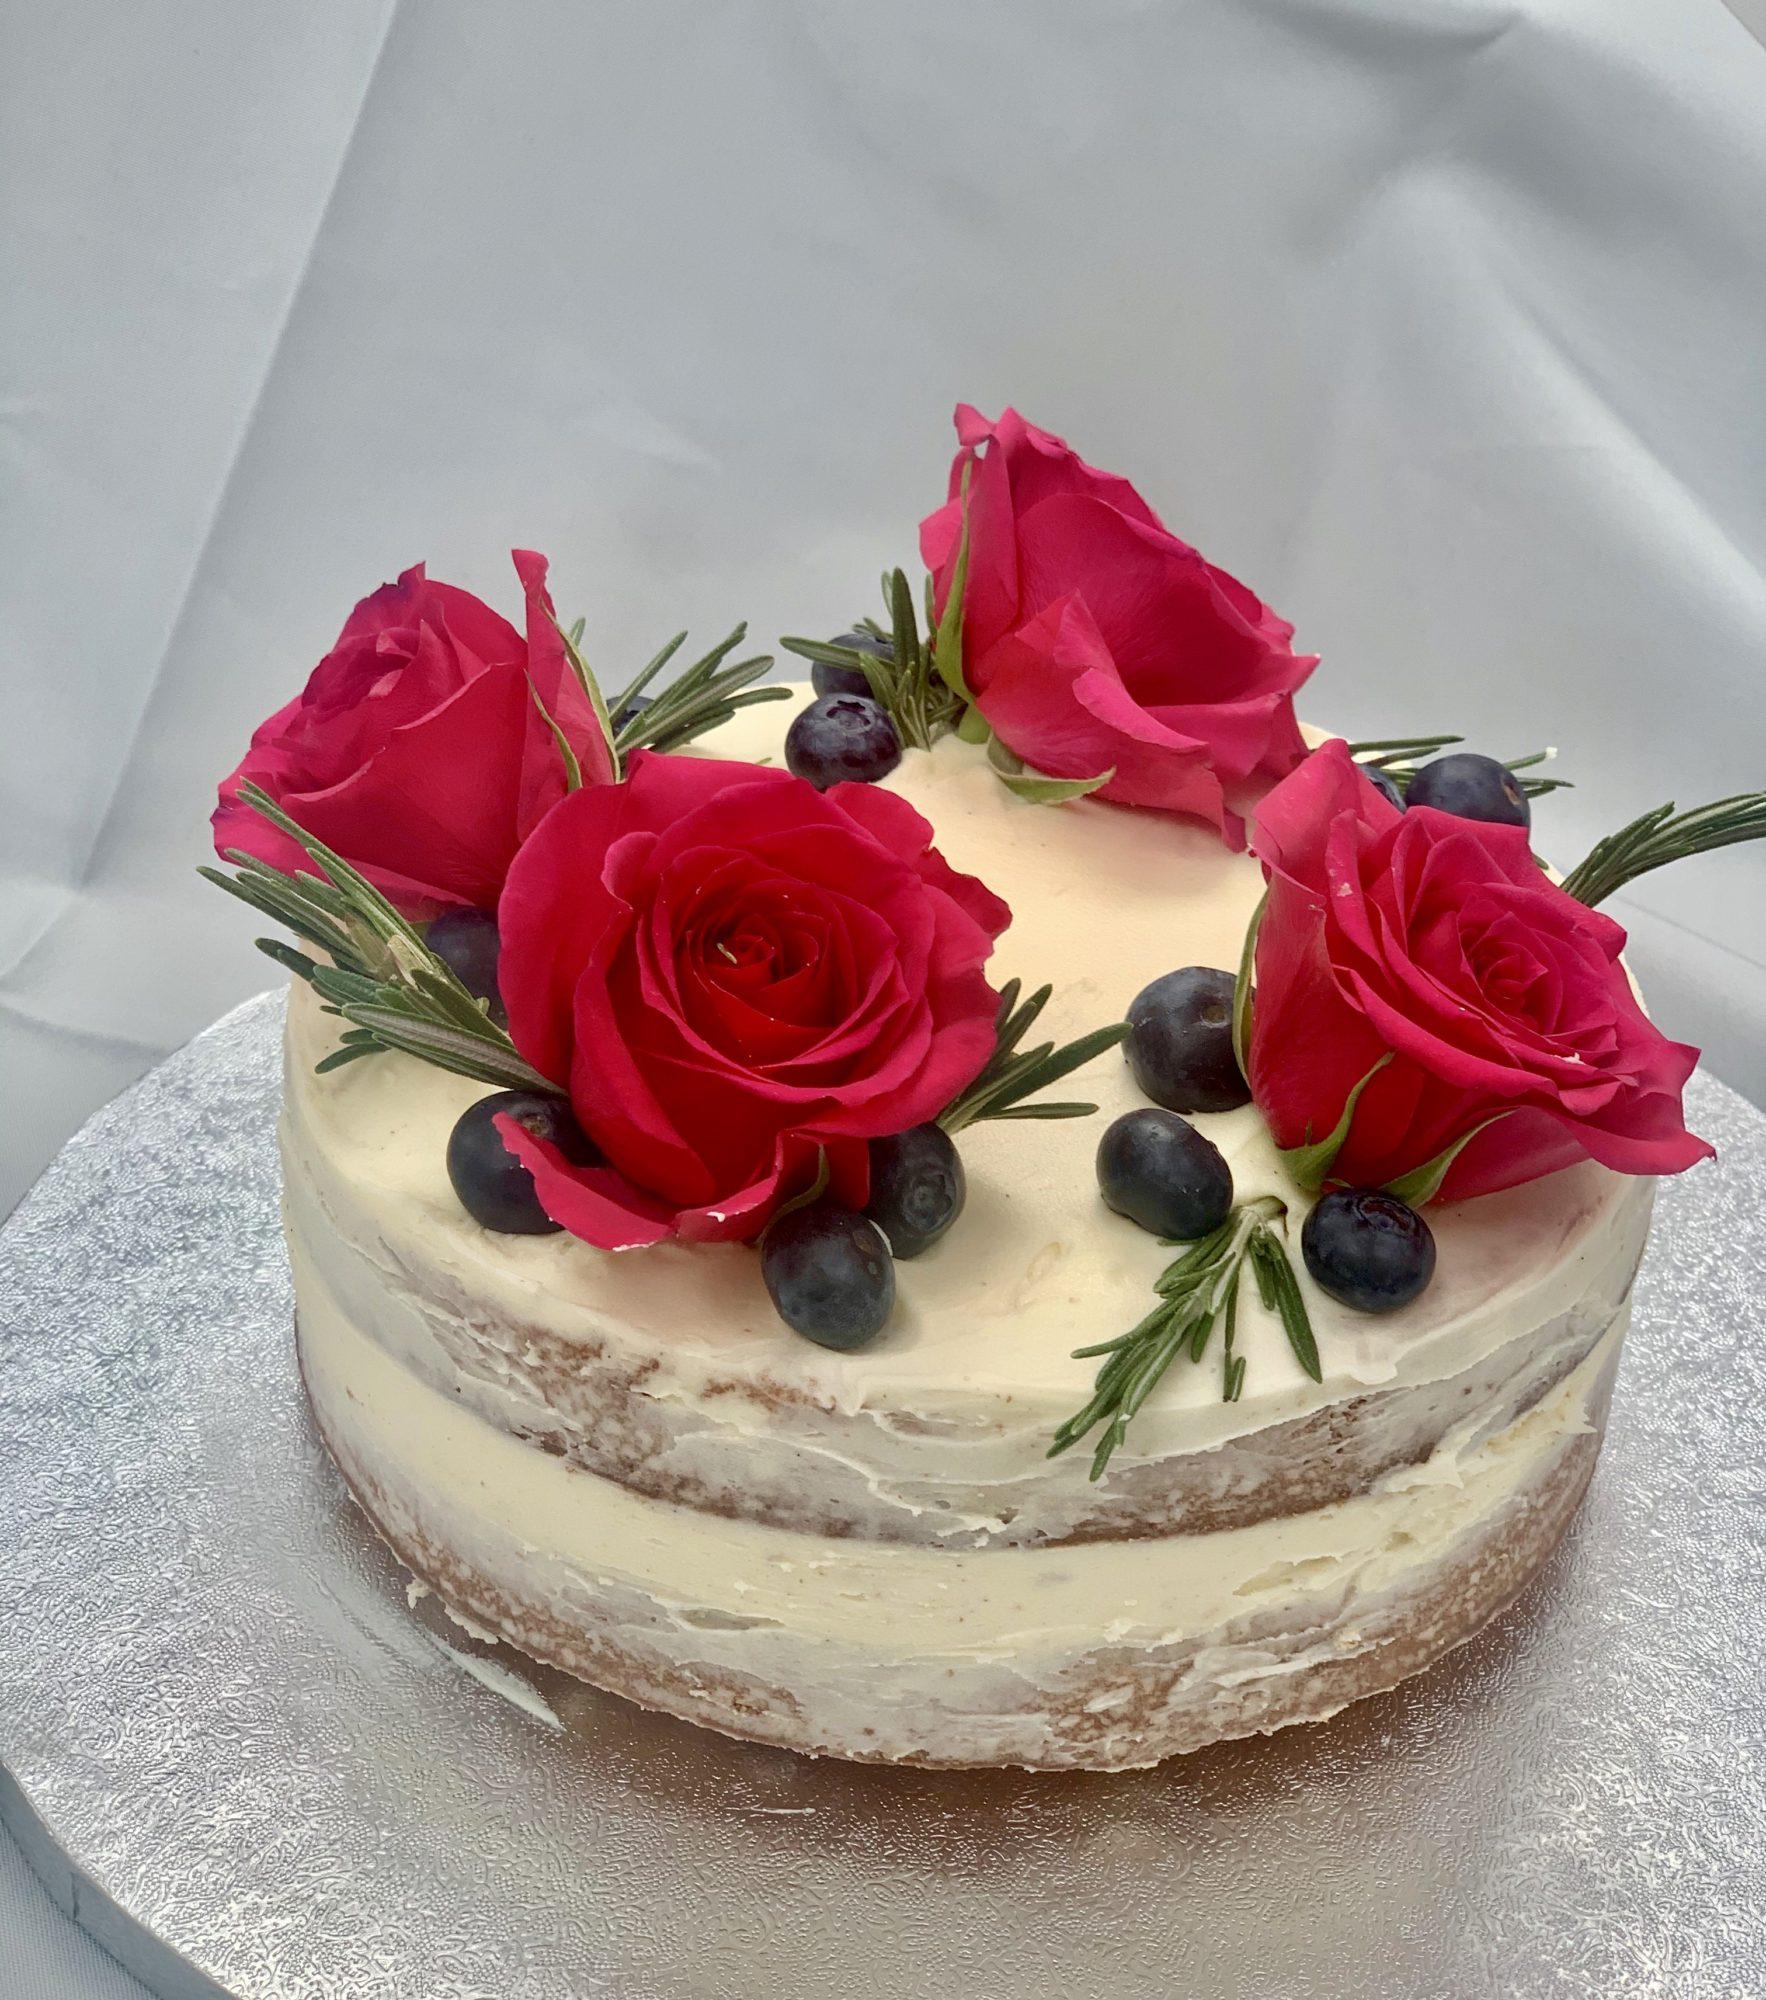 Groovy Easy Naked Birthday Cake Easy Peasy Lemon Squeezy Funny Birthday Cards Online Ioscodamsfinfo